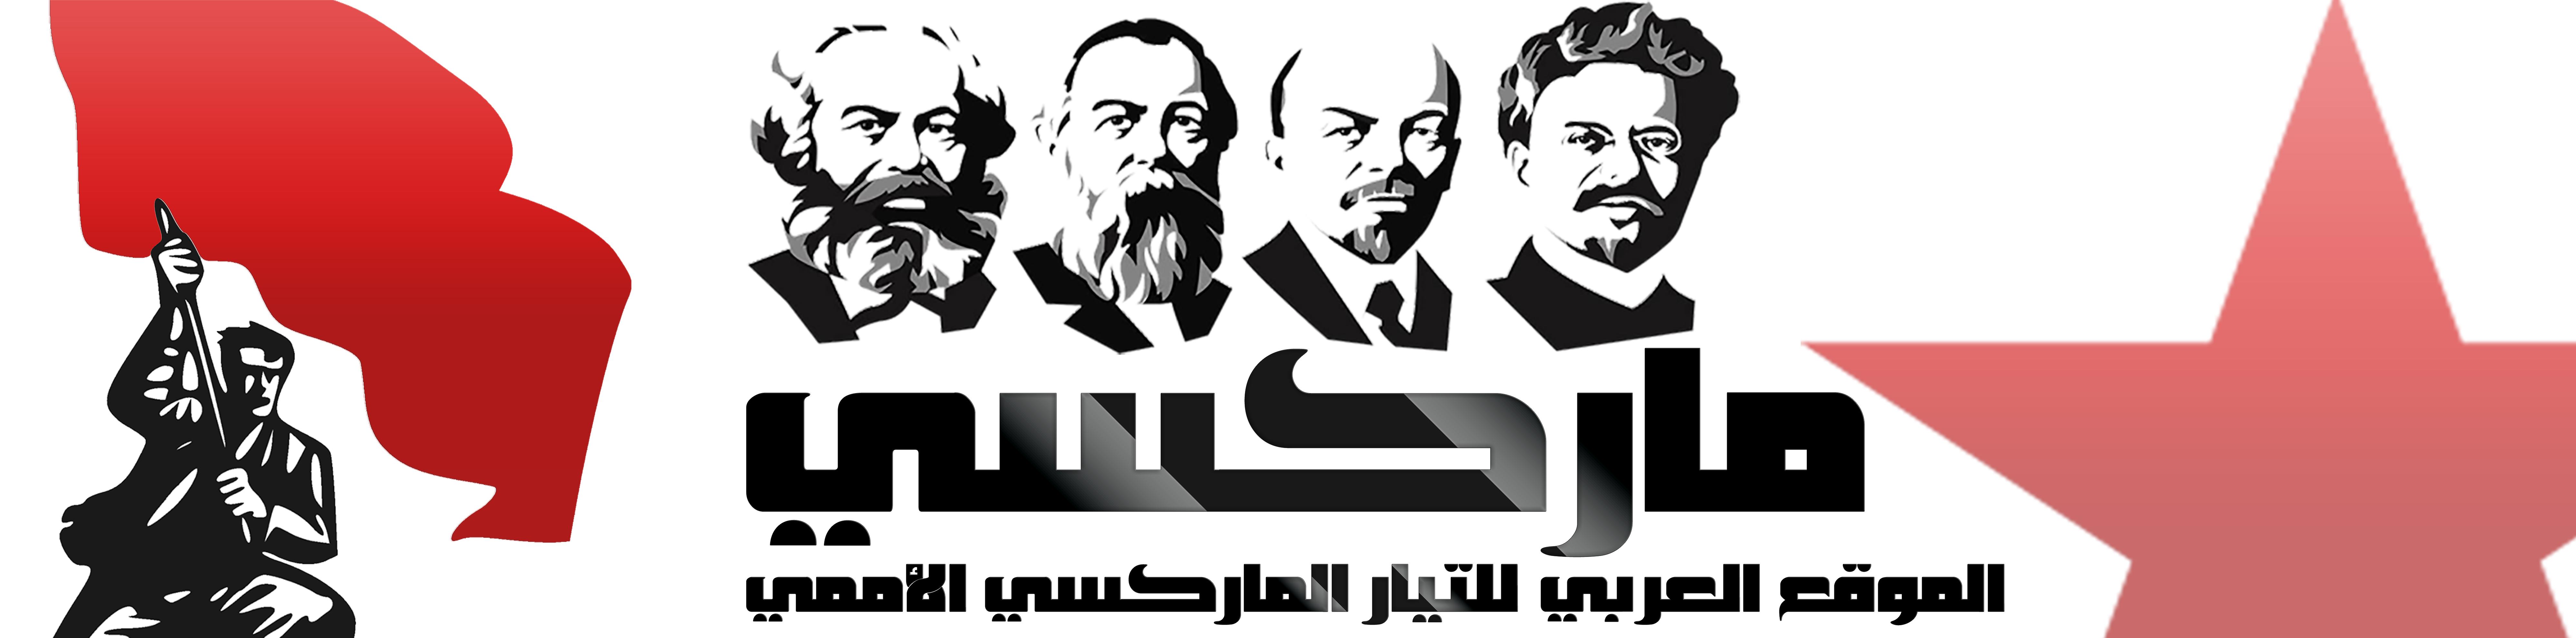 ماركسي